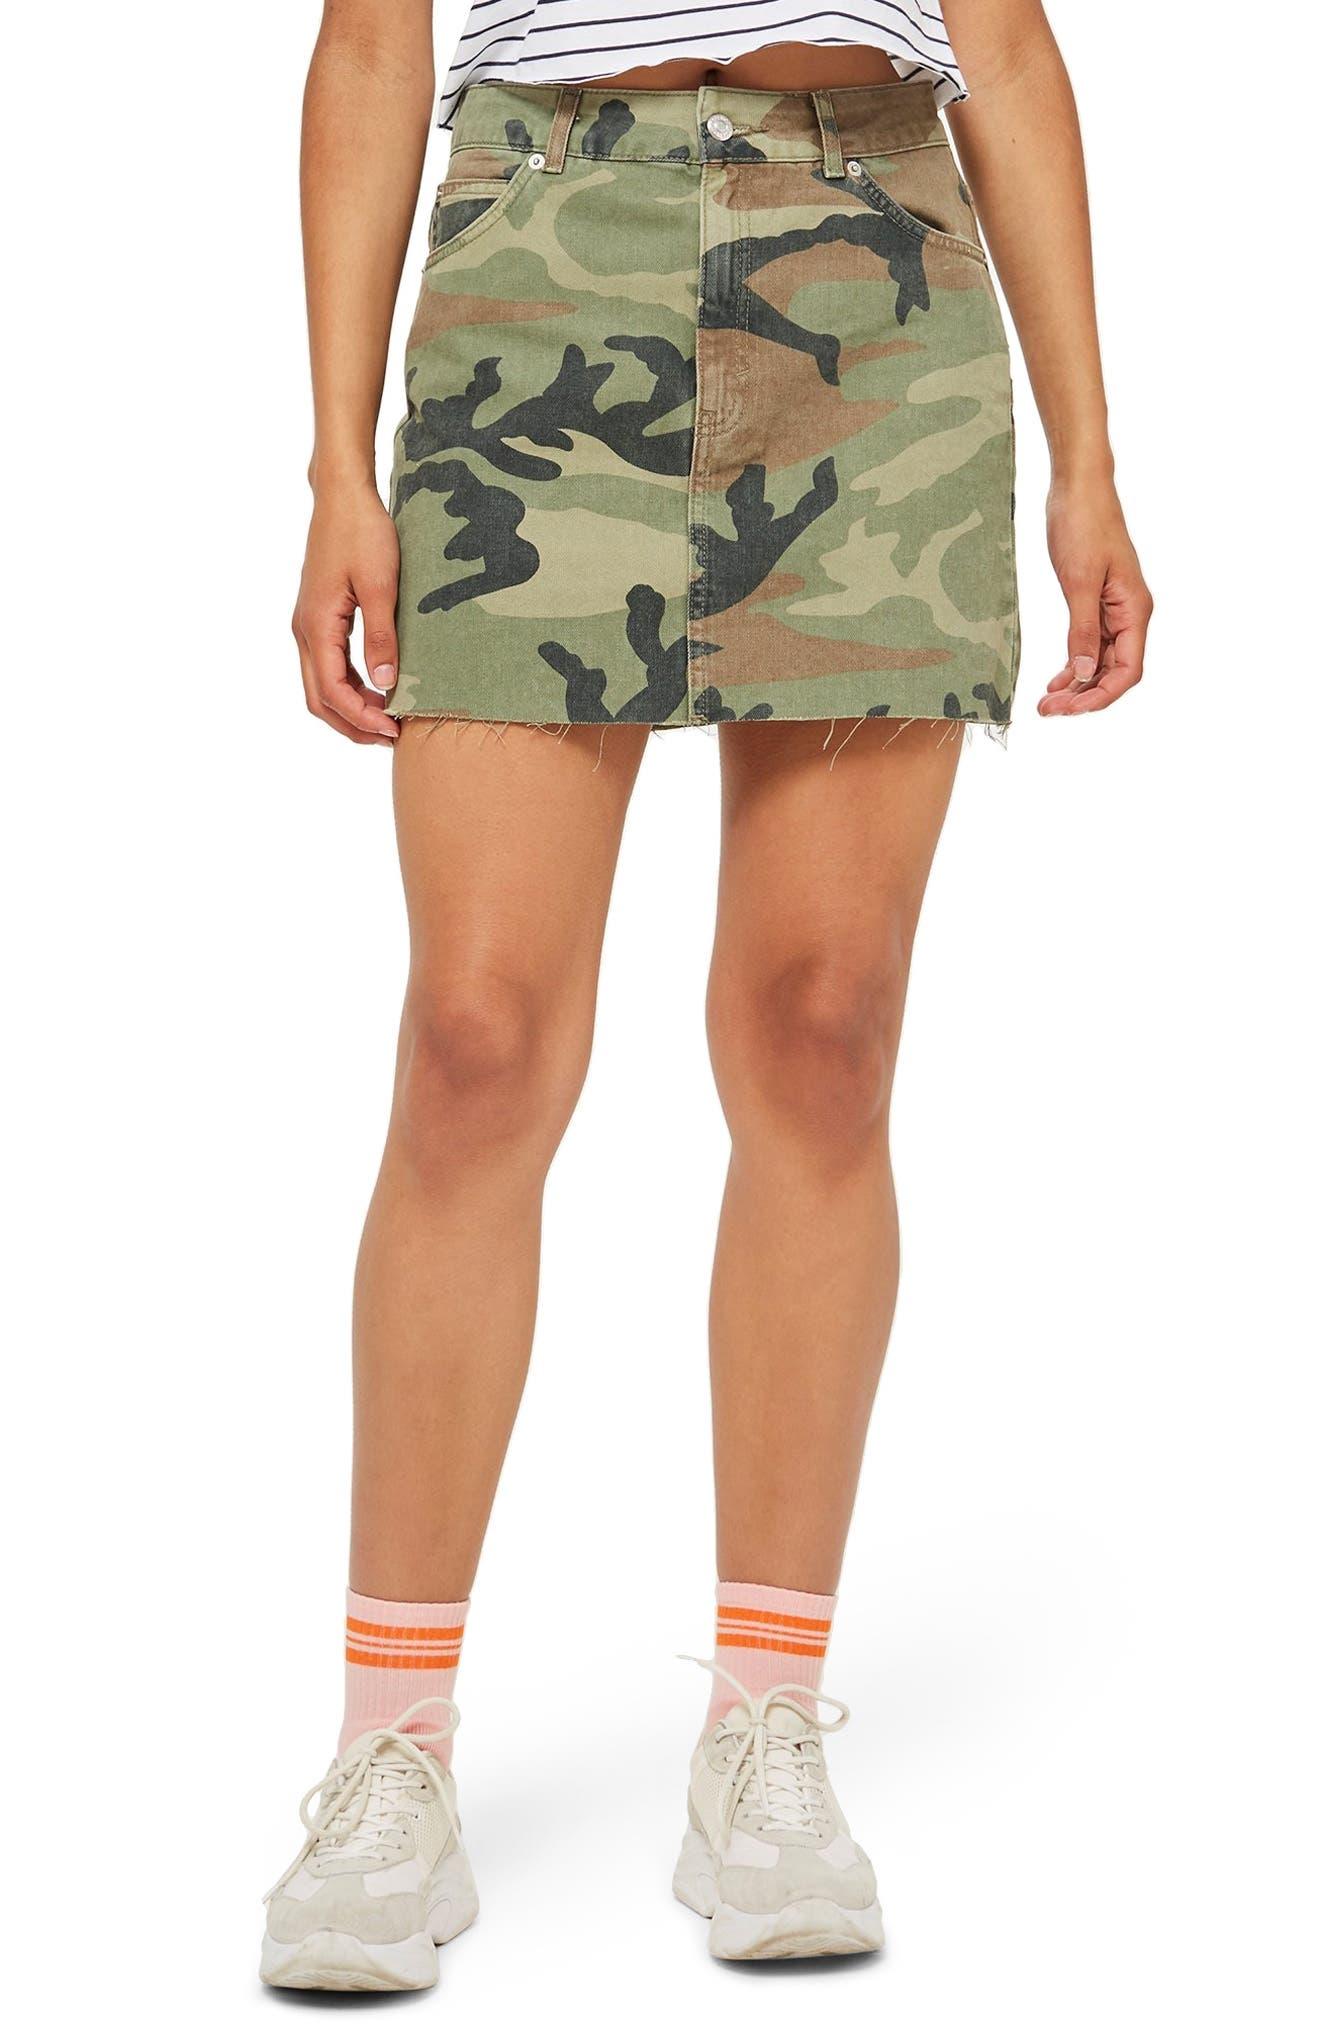 Topshop Camouflage Denim Skirt